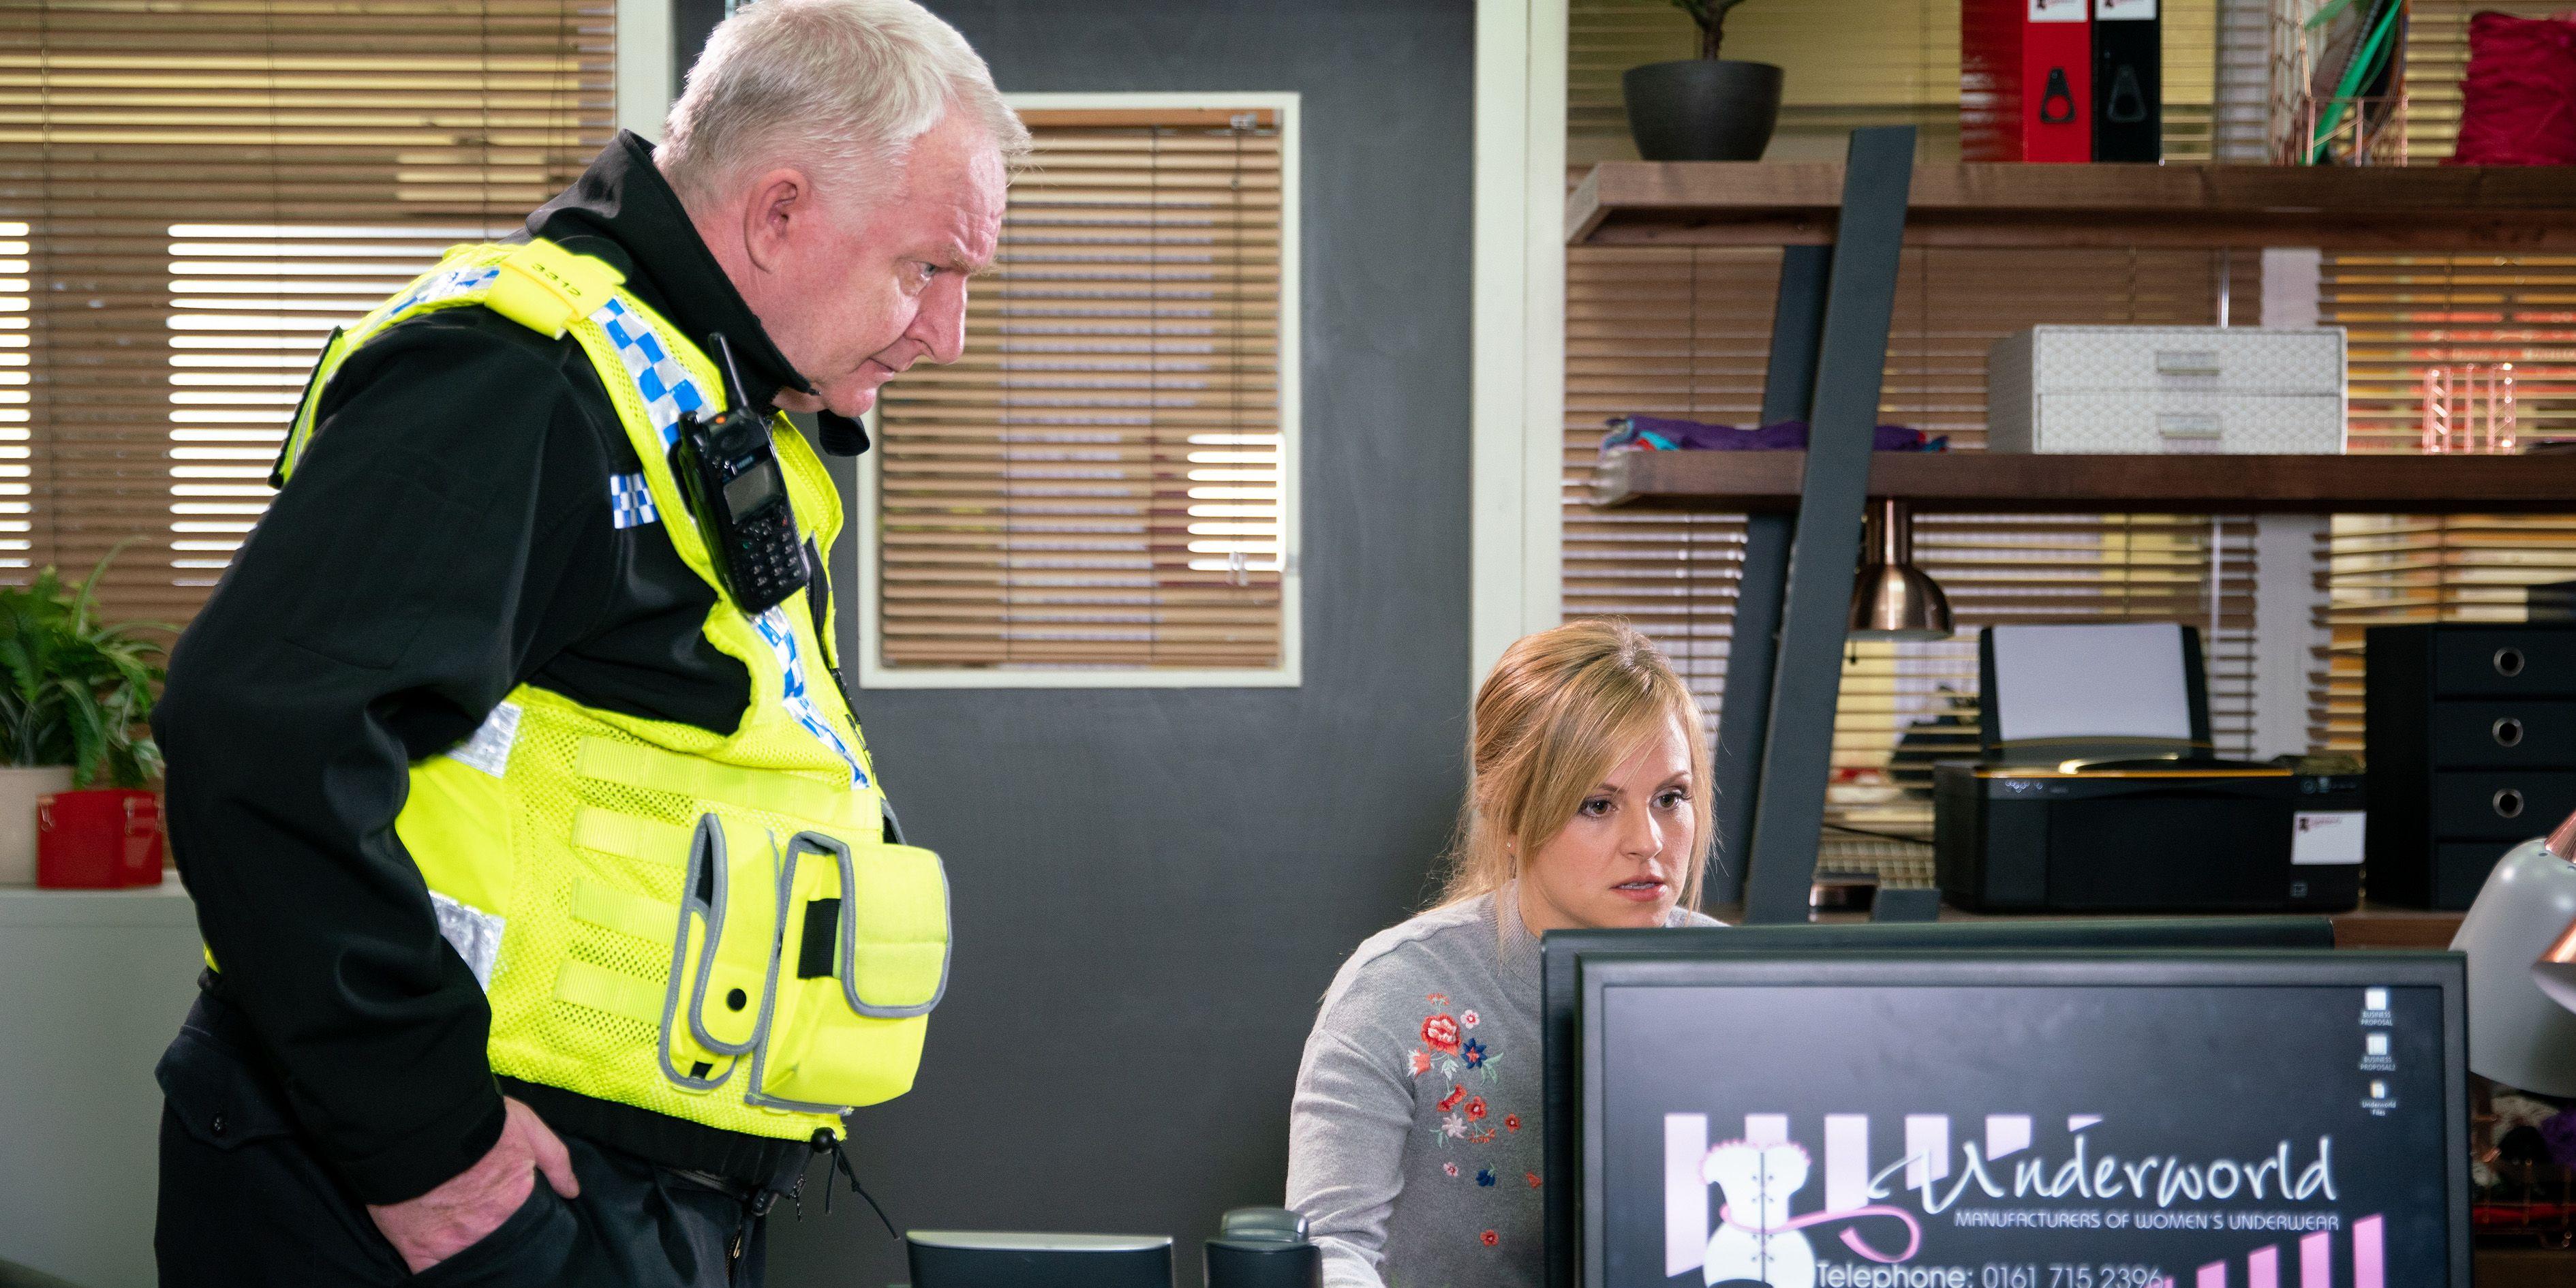 Sarah Platt checks the CCTV in Coronation Street